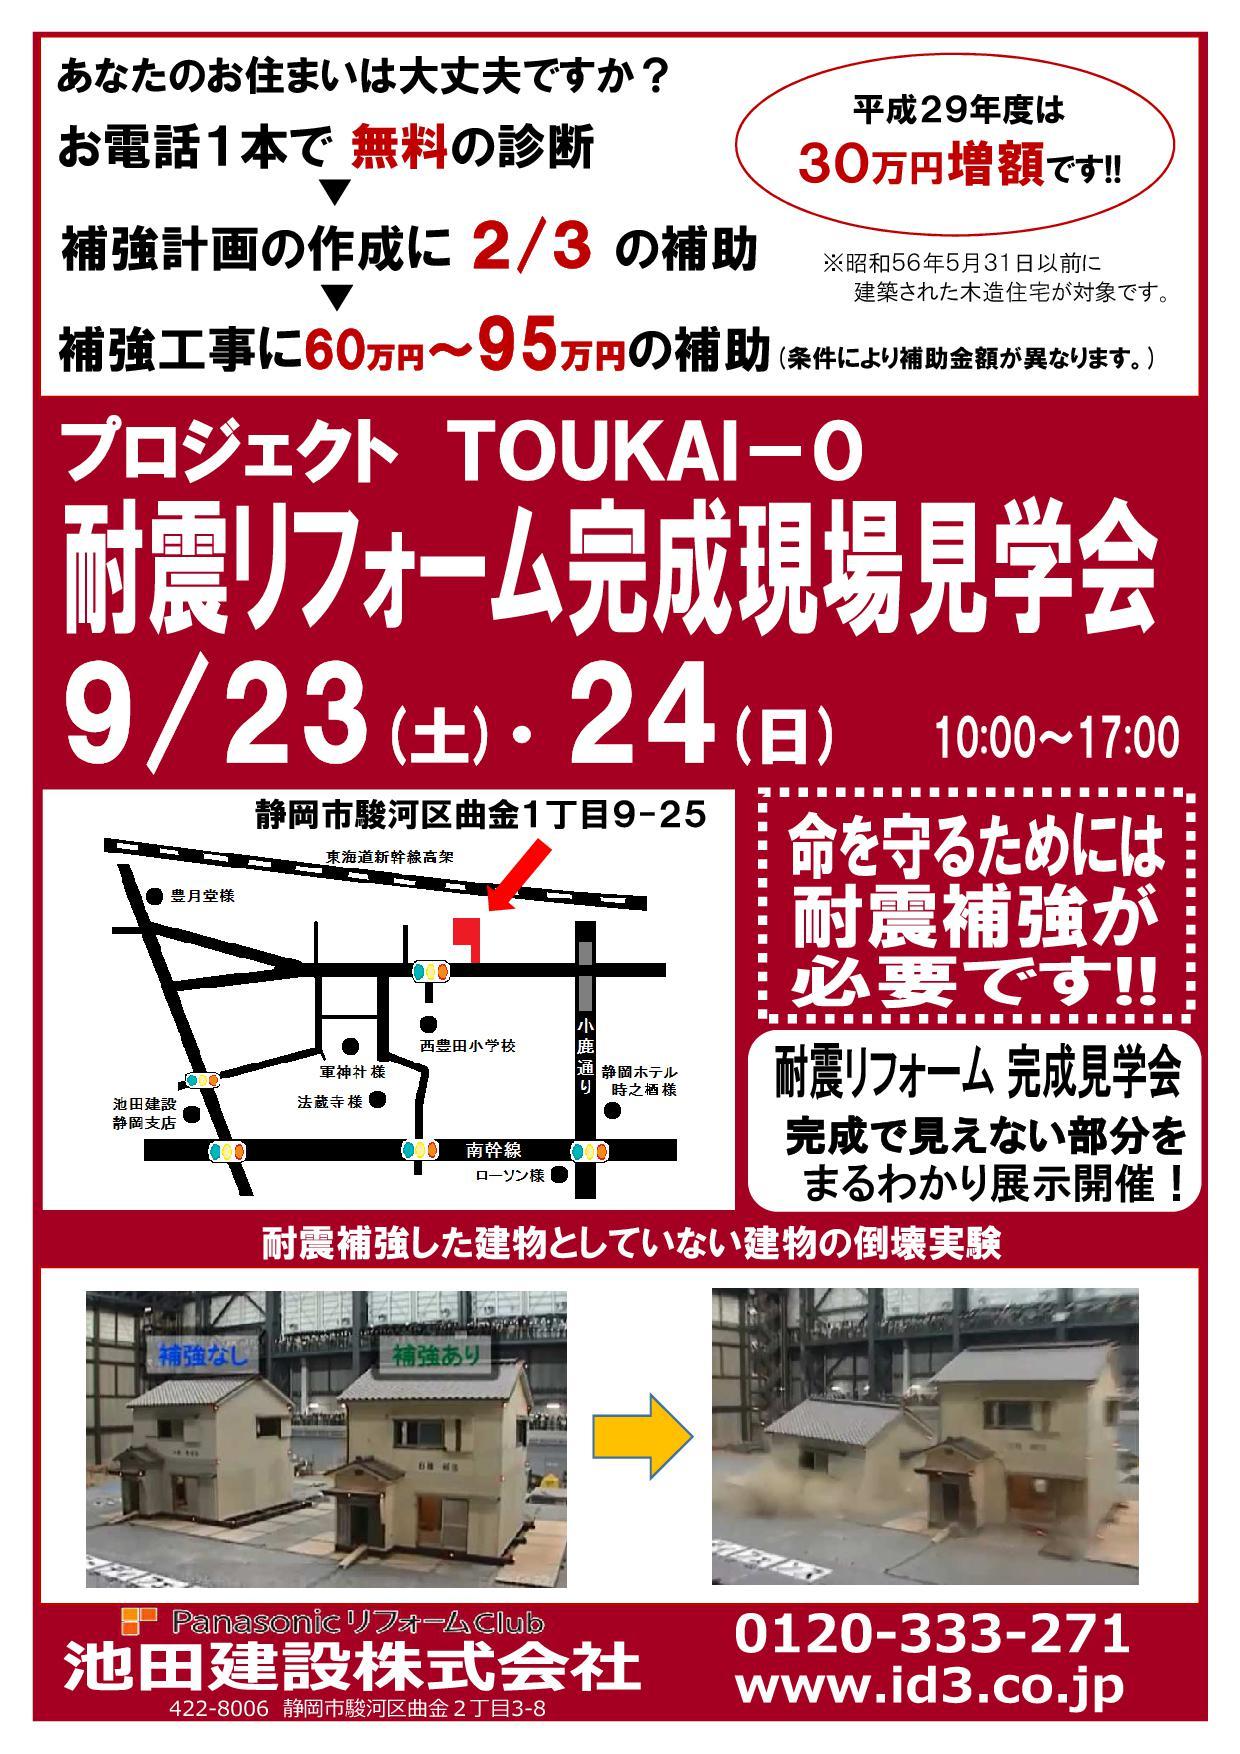 H29092324櫻井様邸耐震リフォーム見学会チラシ